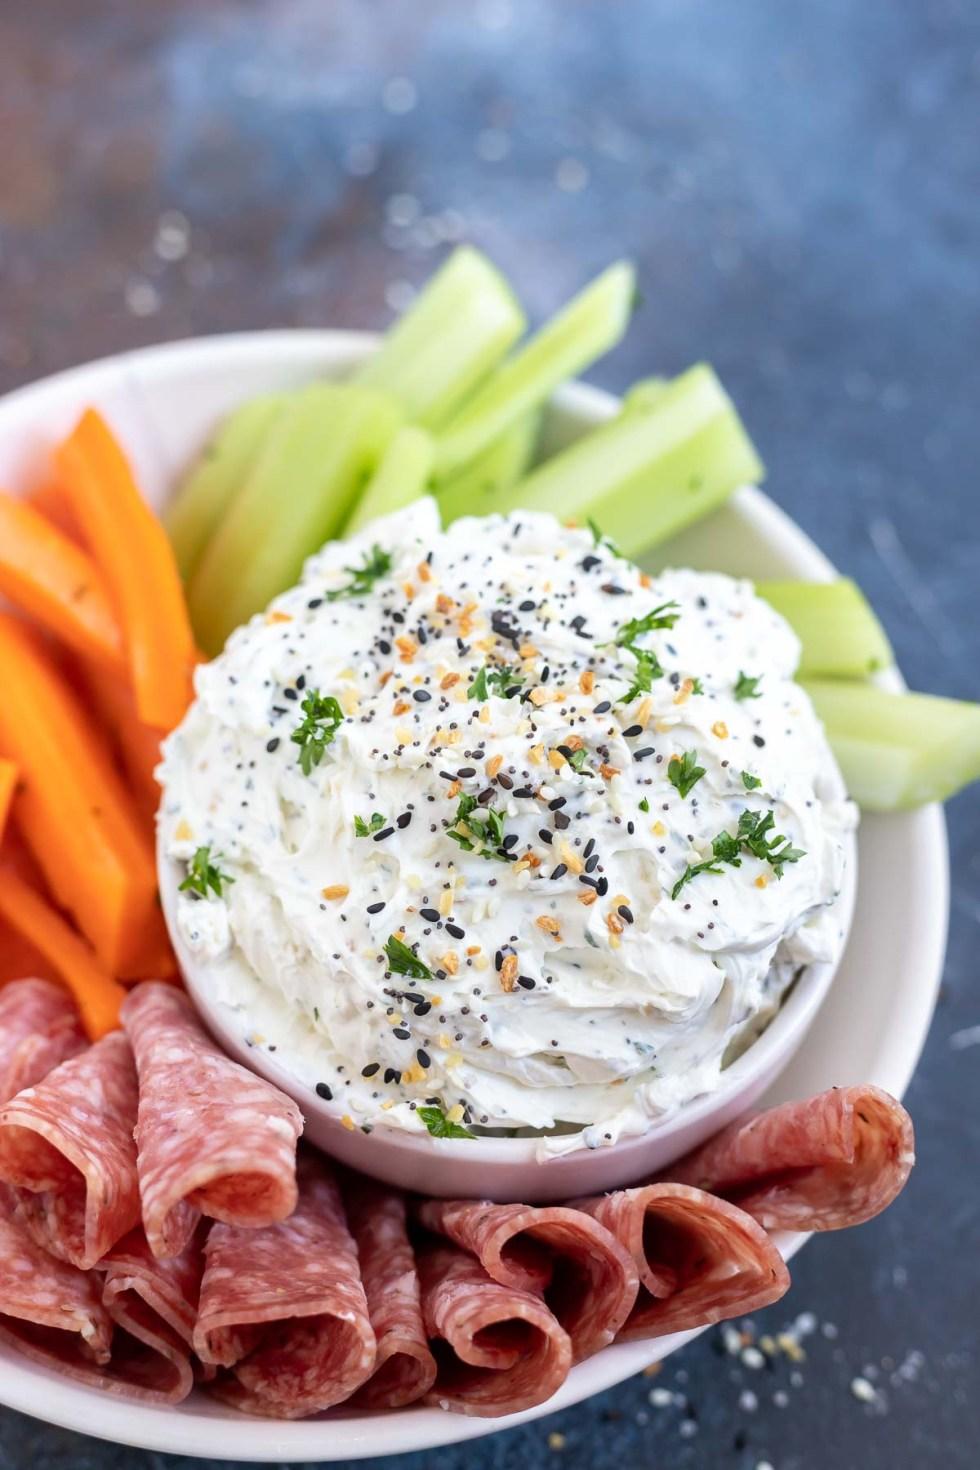 prepared dip in white bowl next to salami and veggies